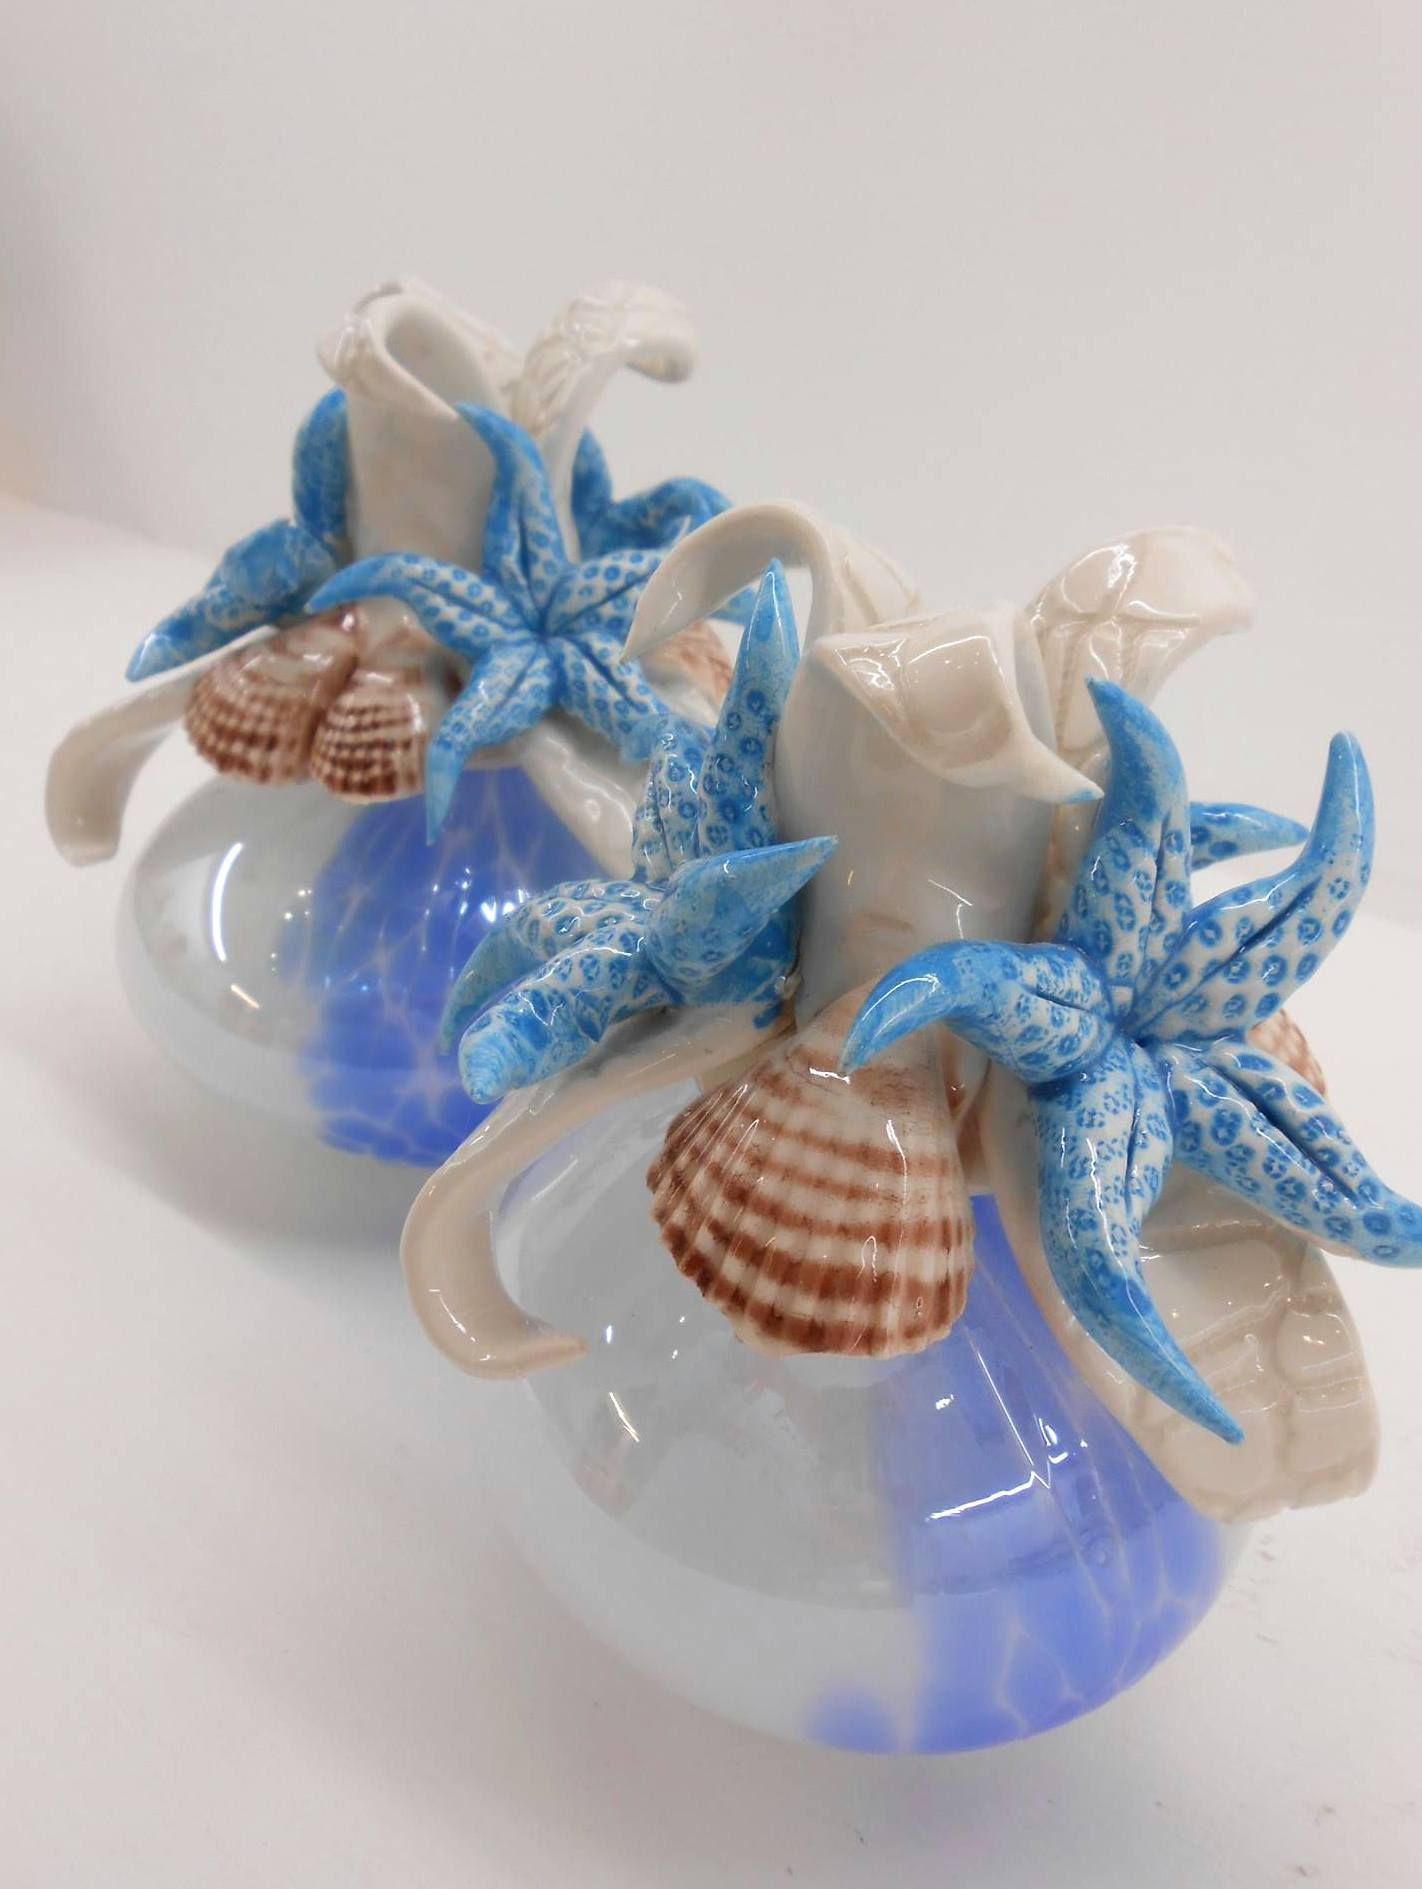 Bomboniere Matrimonio Marine.Favors For Weddings In Porcelain Essences Diffusers With